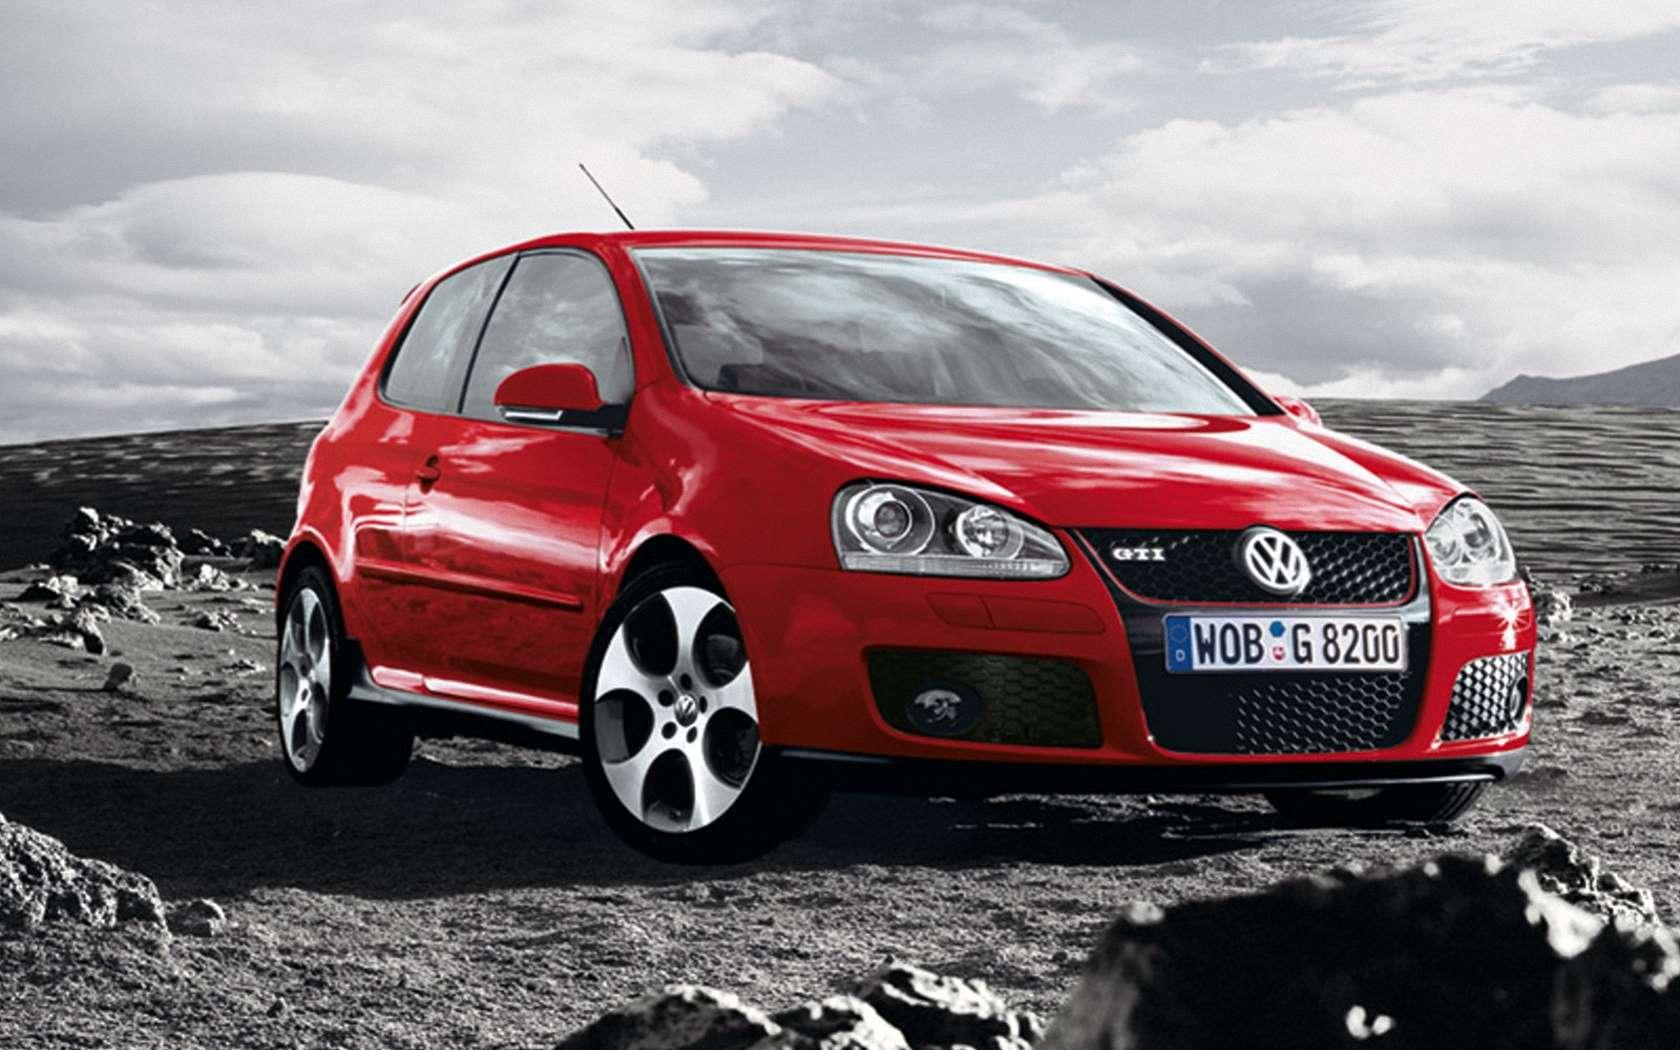 Golf Wallpaper Hd Auto Bilder Volkswagen